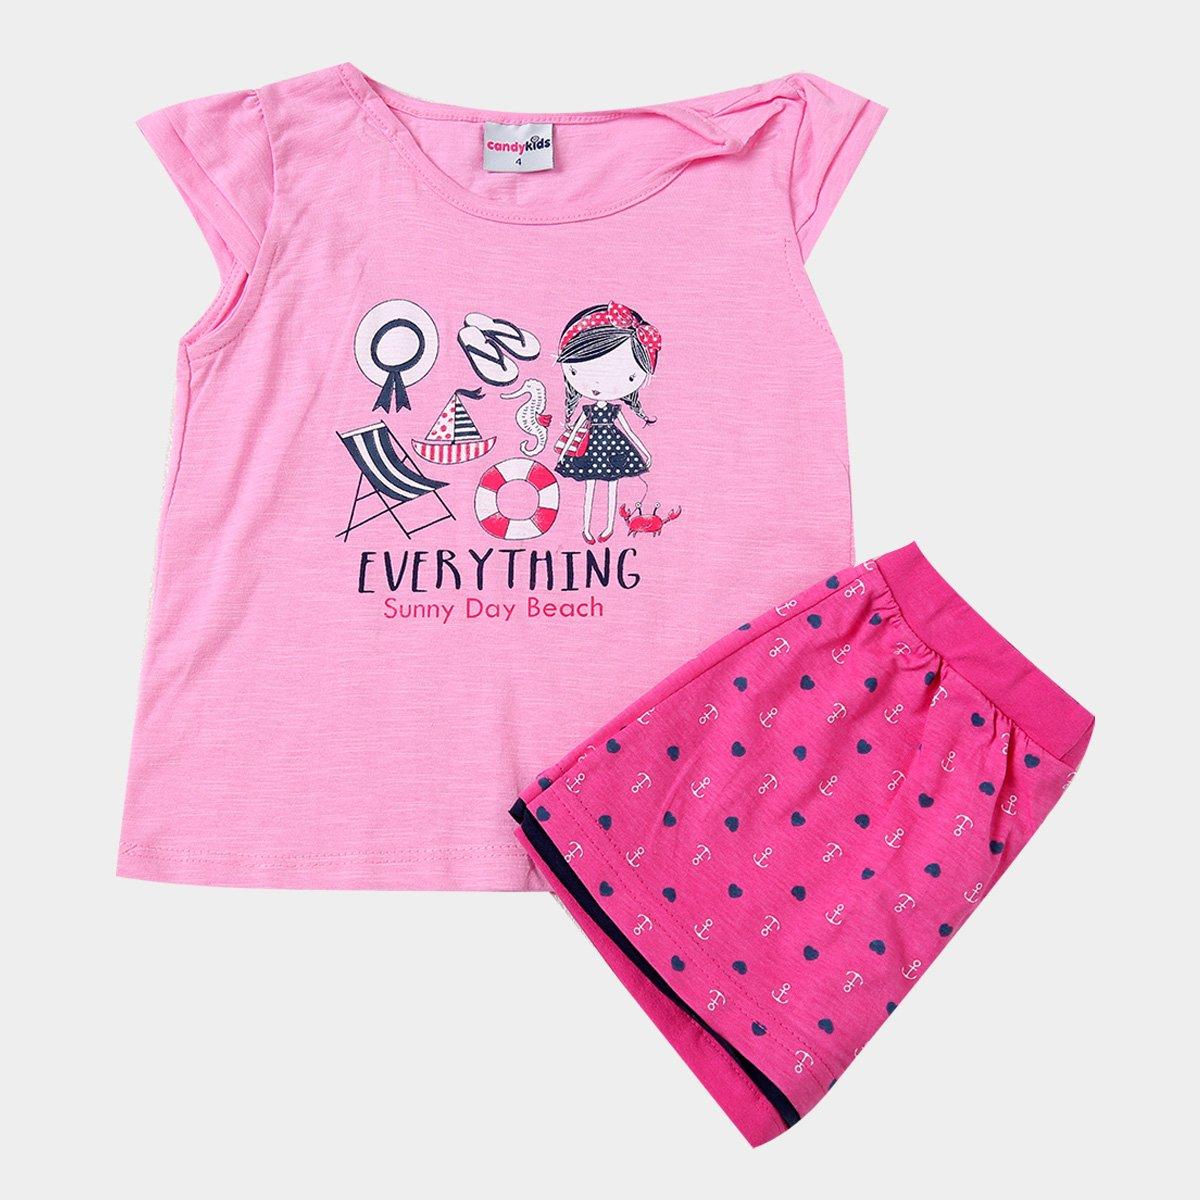 Foto 1 - Conjunto Infantil Candy Kids Everything Feminino